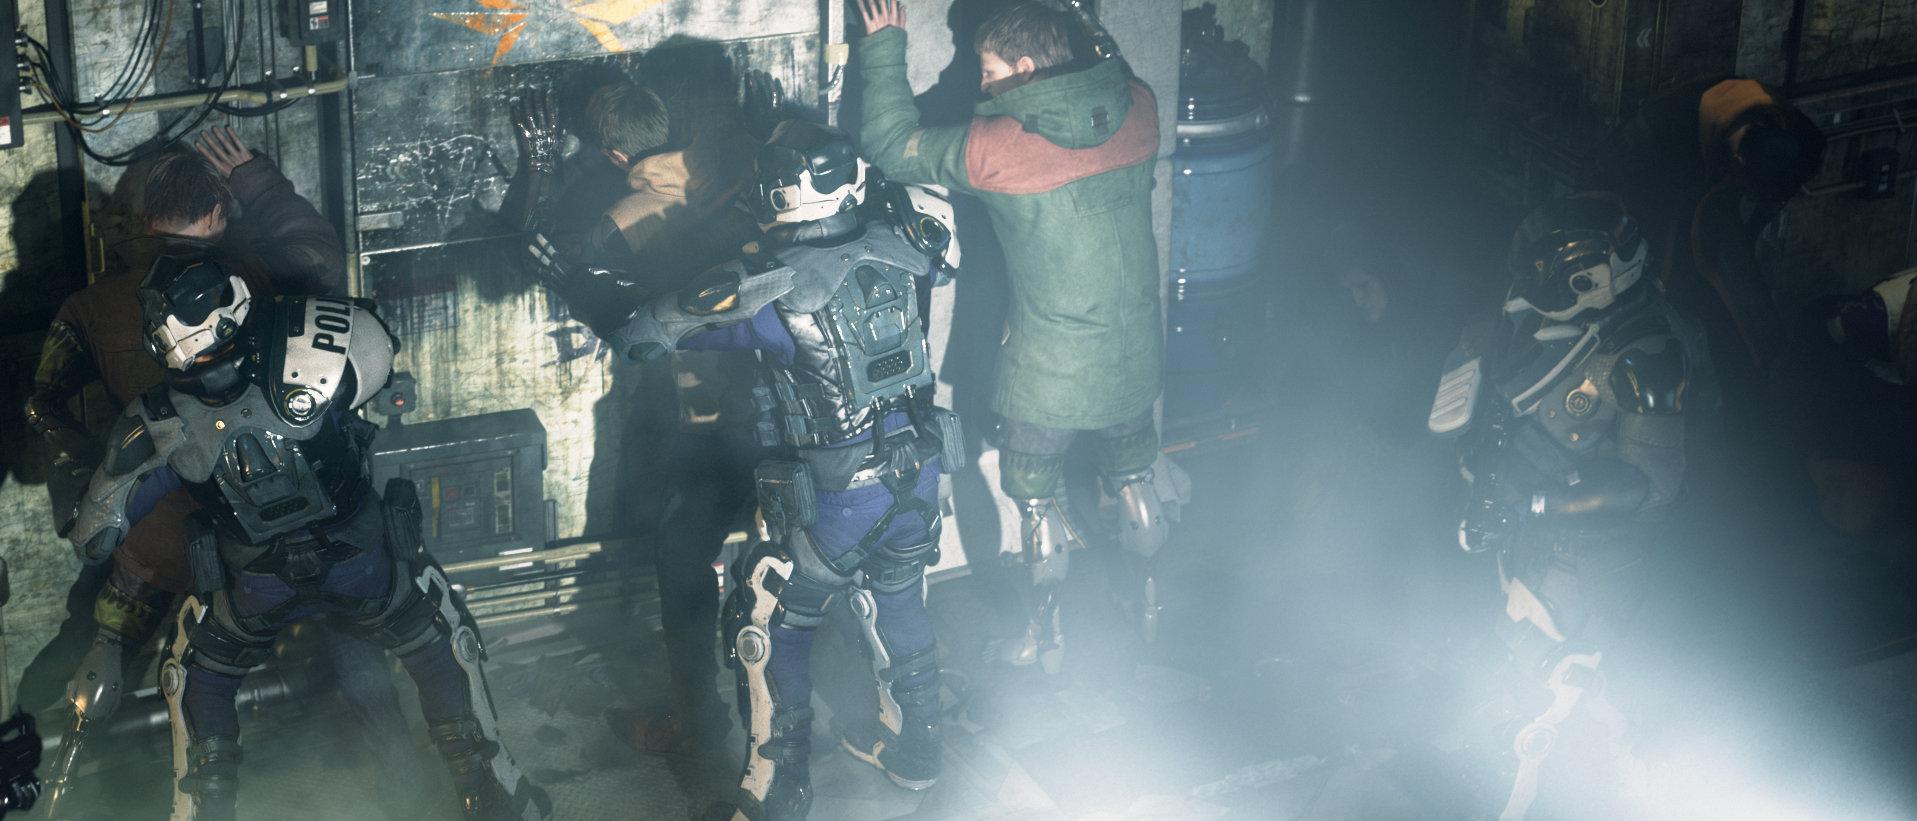 Deus Ex: Mankind Divided Trailer Reveals The Sequel's Story #32698